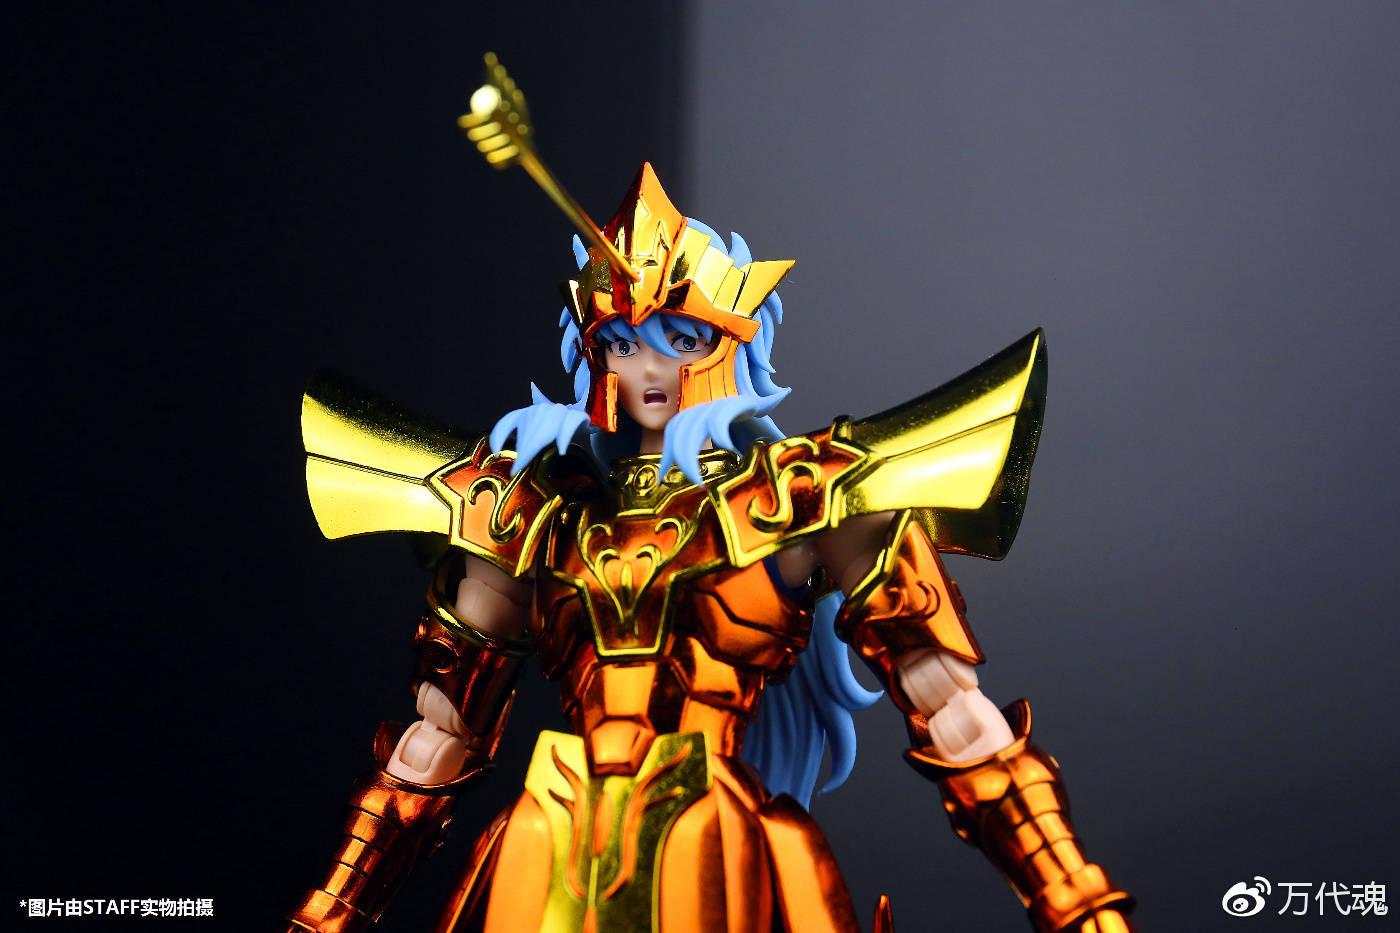 [Imagens] Poseidon EX & Poseidon EX Imperial Throne Set 2w1CuSFu_o